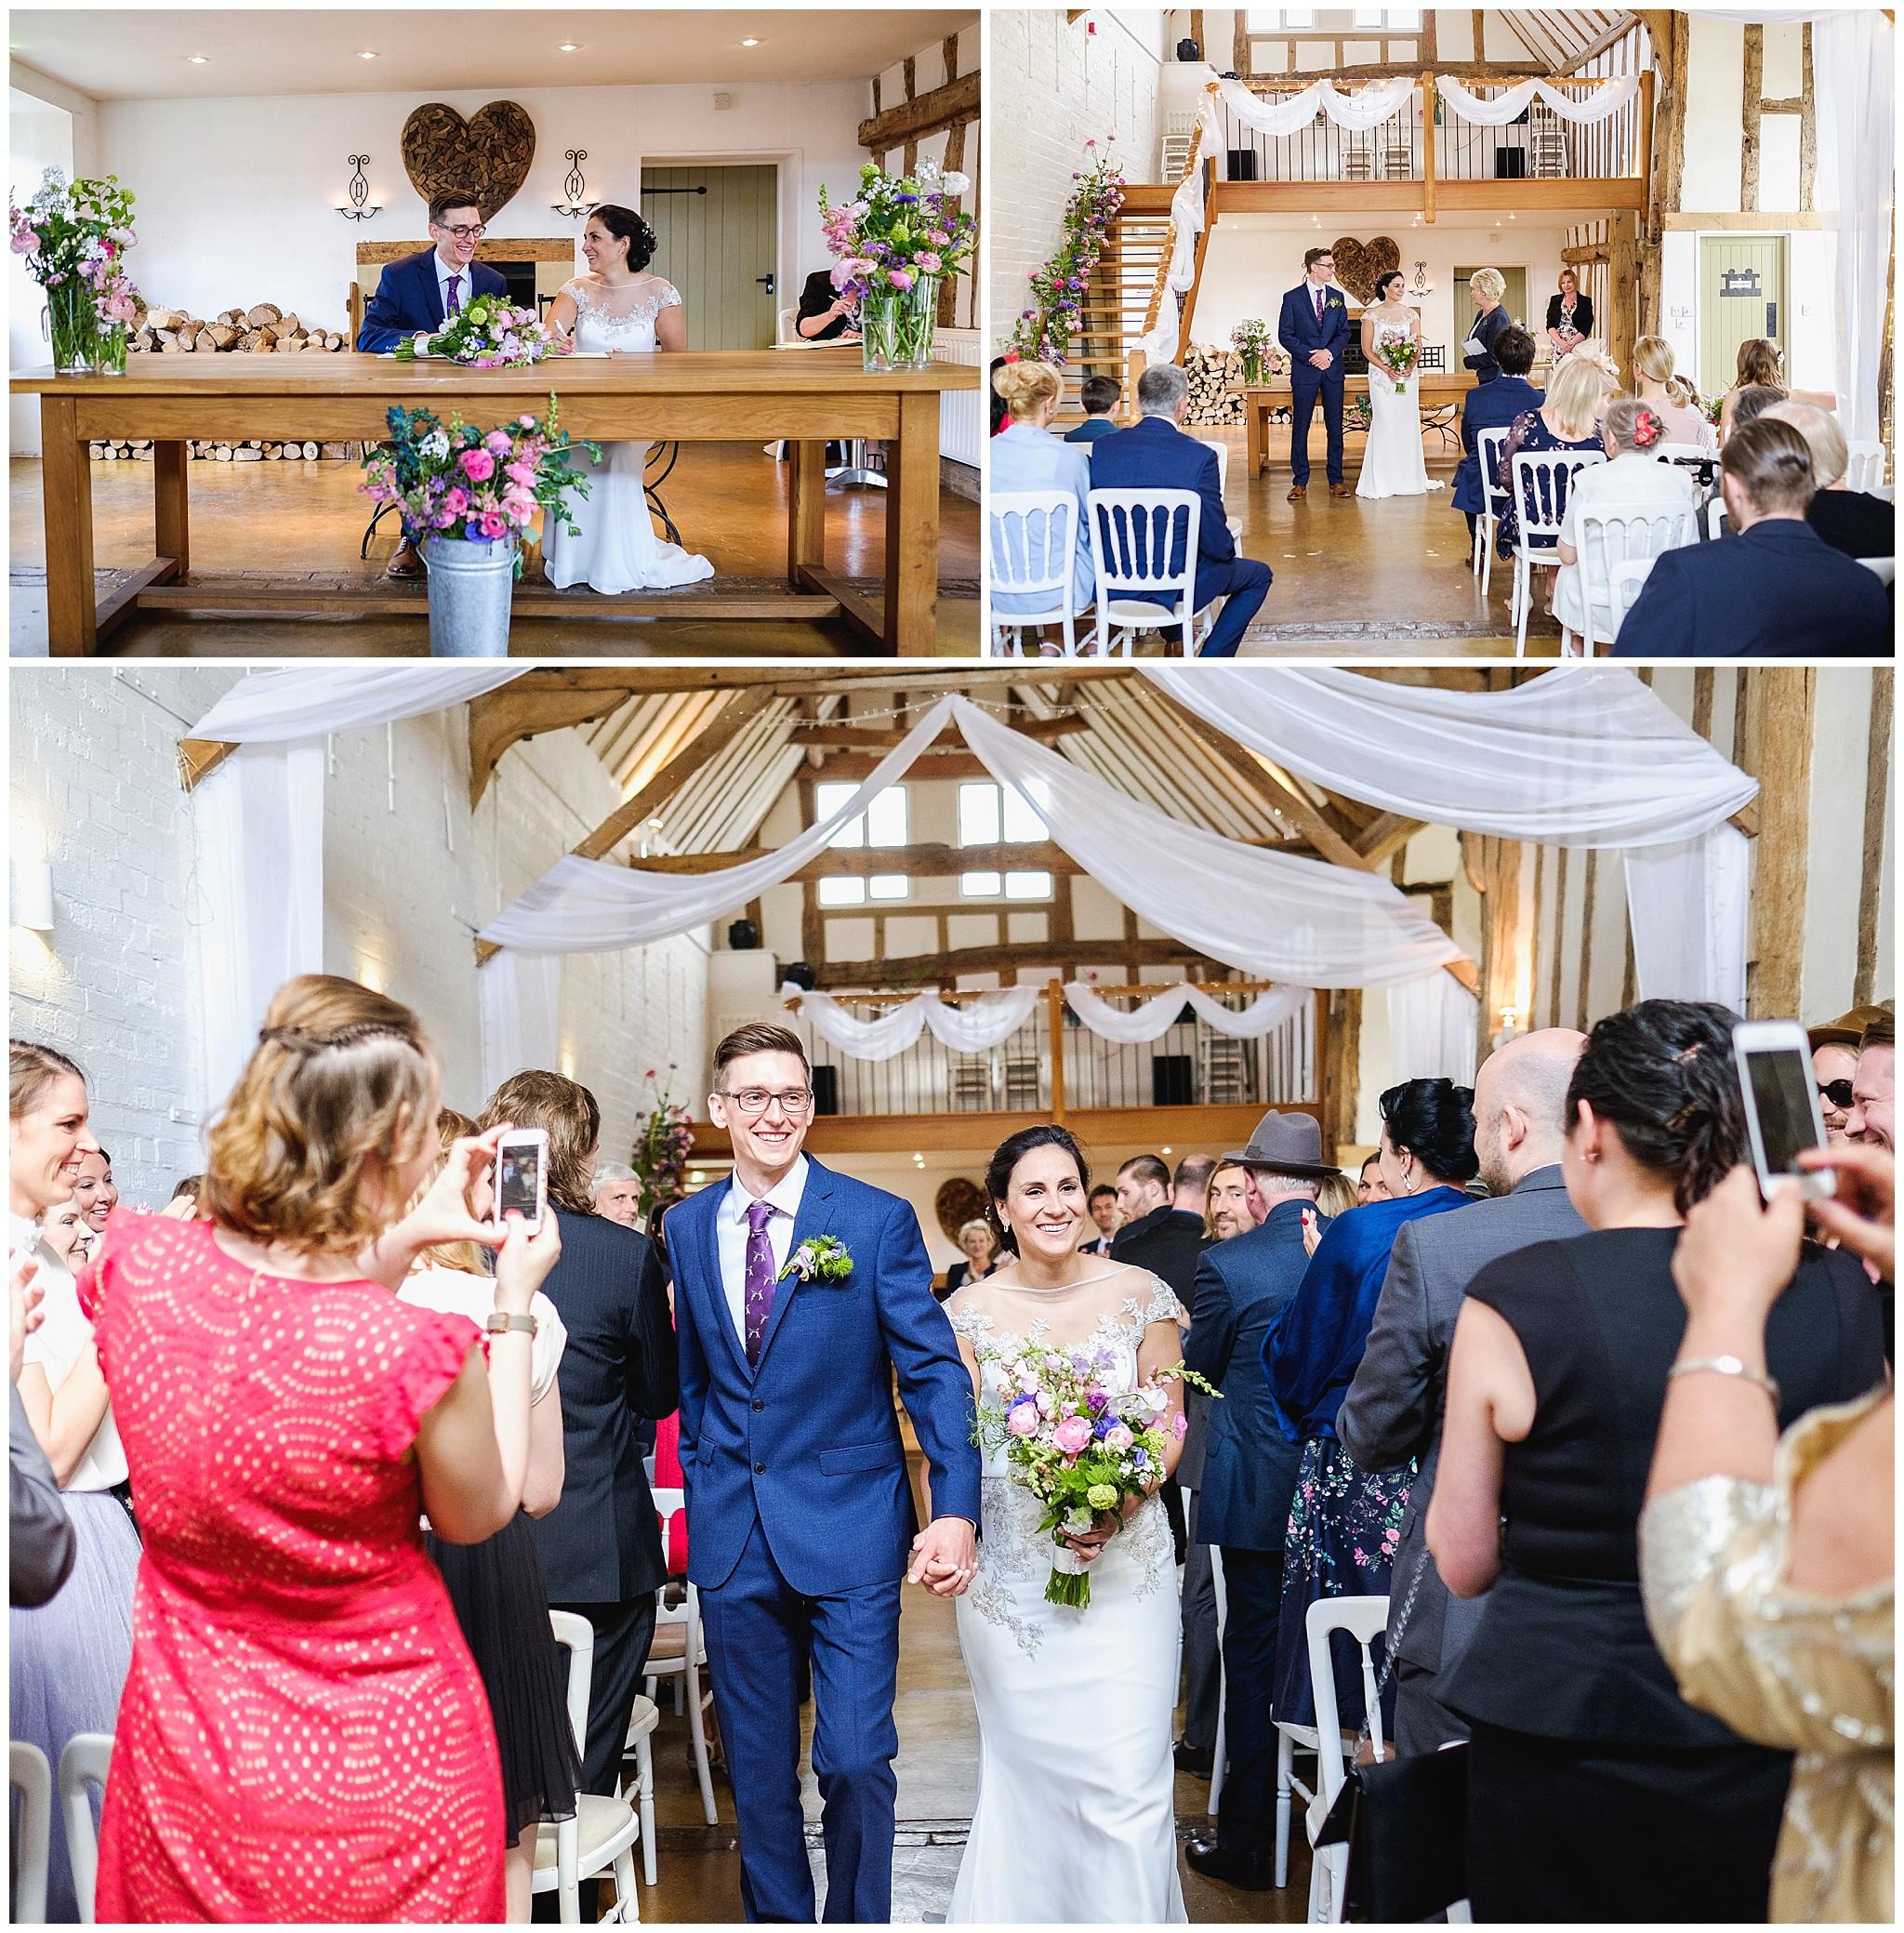 Wedding couple walk down the aisle